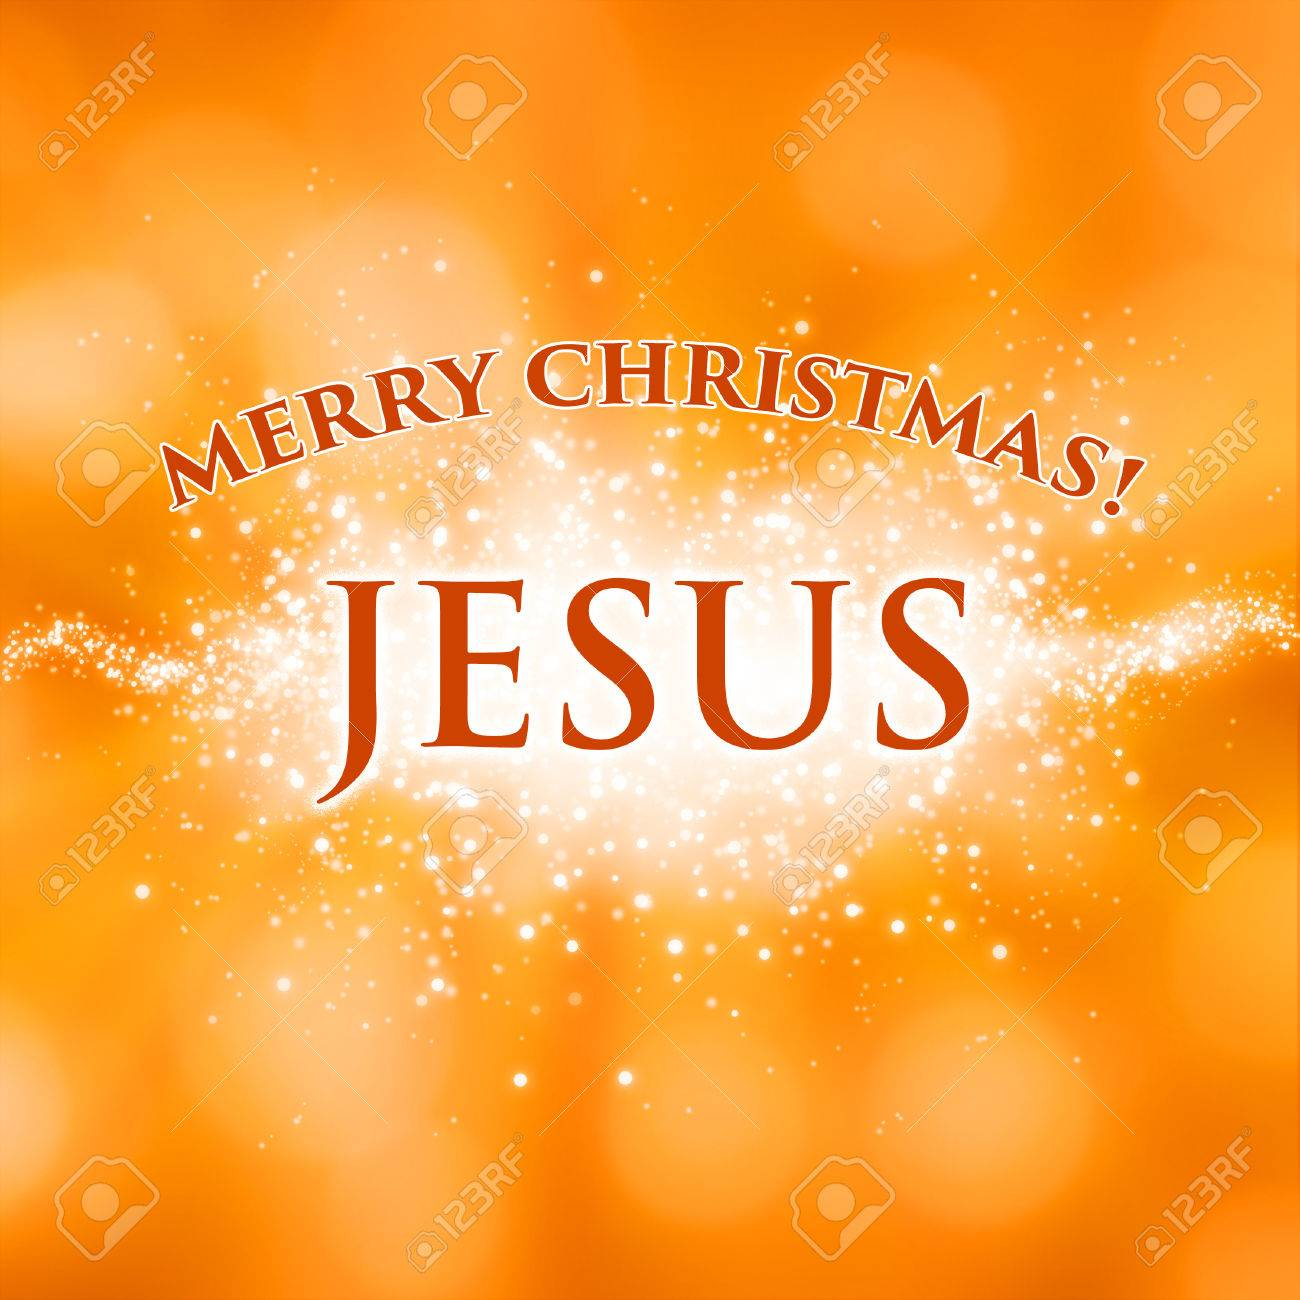 Frohe Weihnachten Jesus.Stock Photo